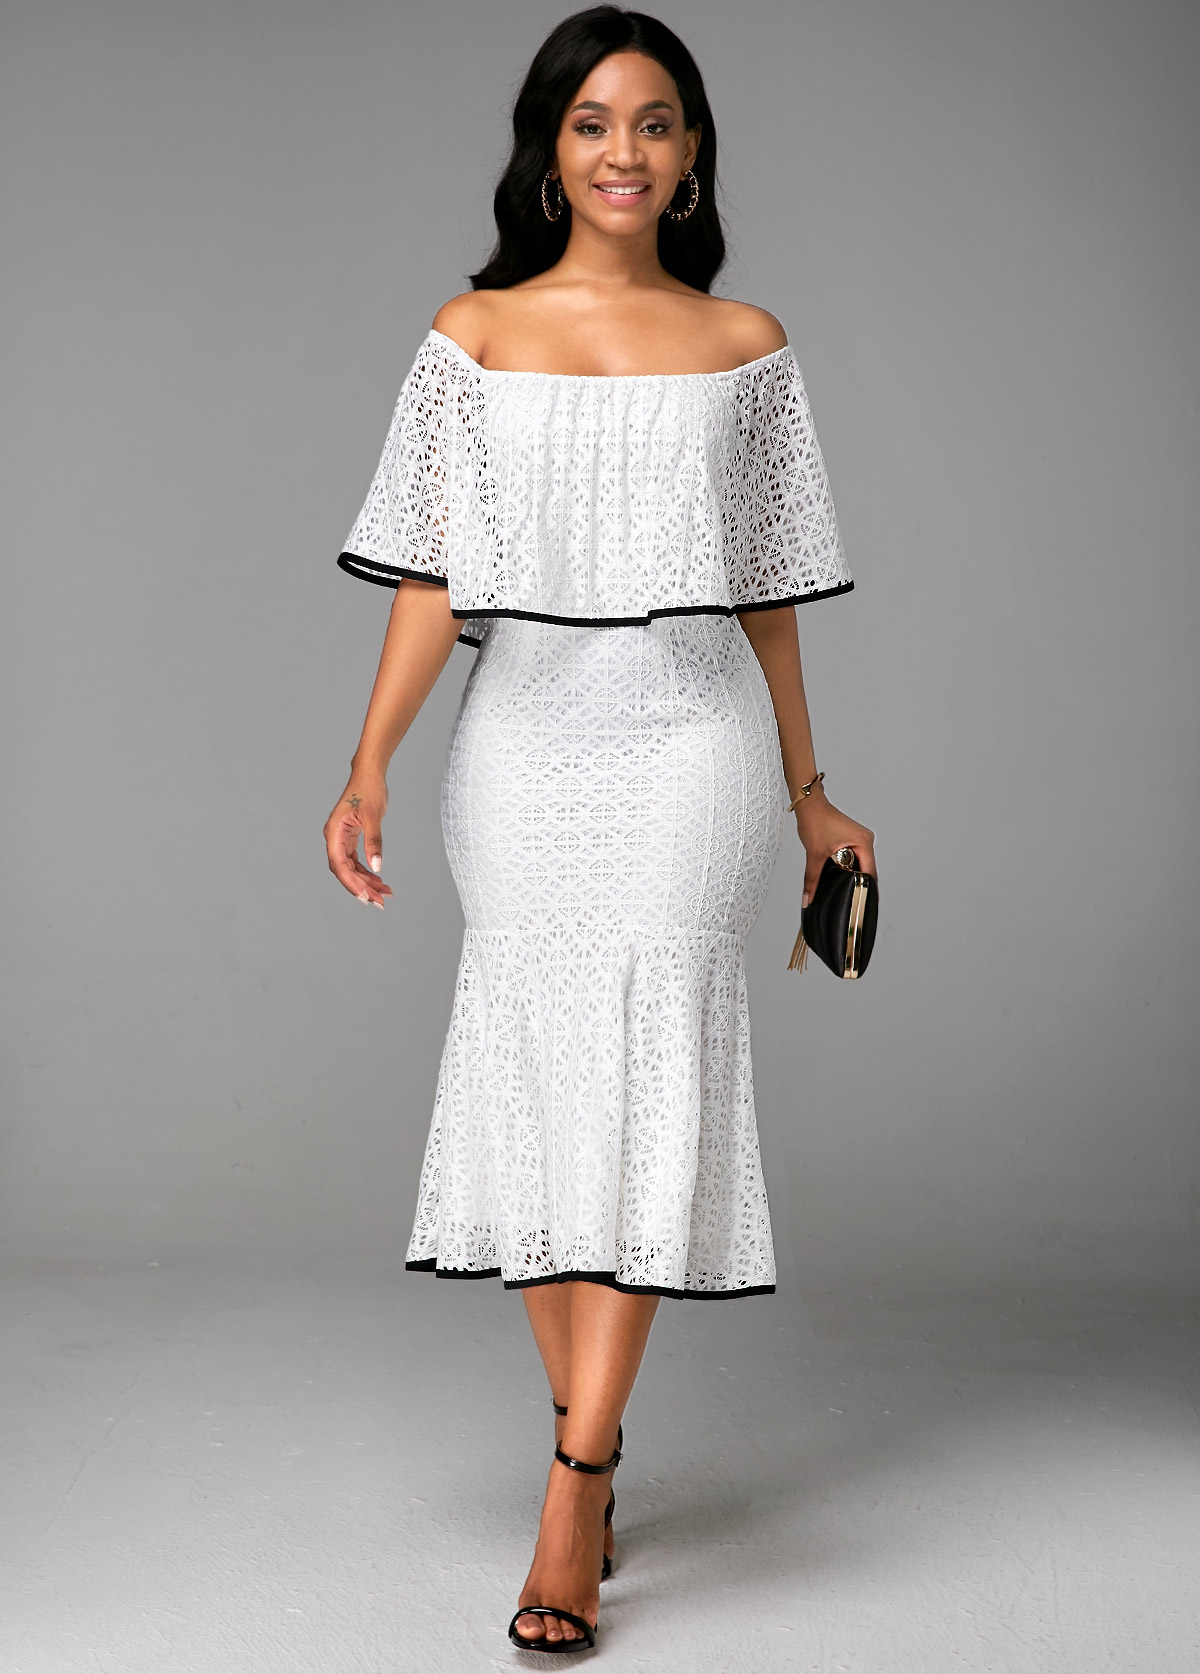 Ruffle Overlay Boat Neck White Lace Dress